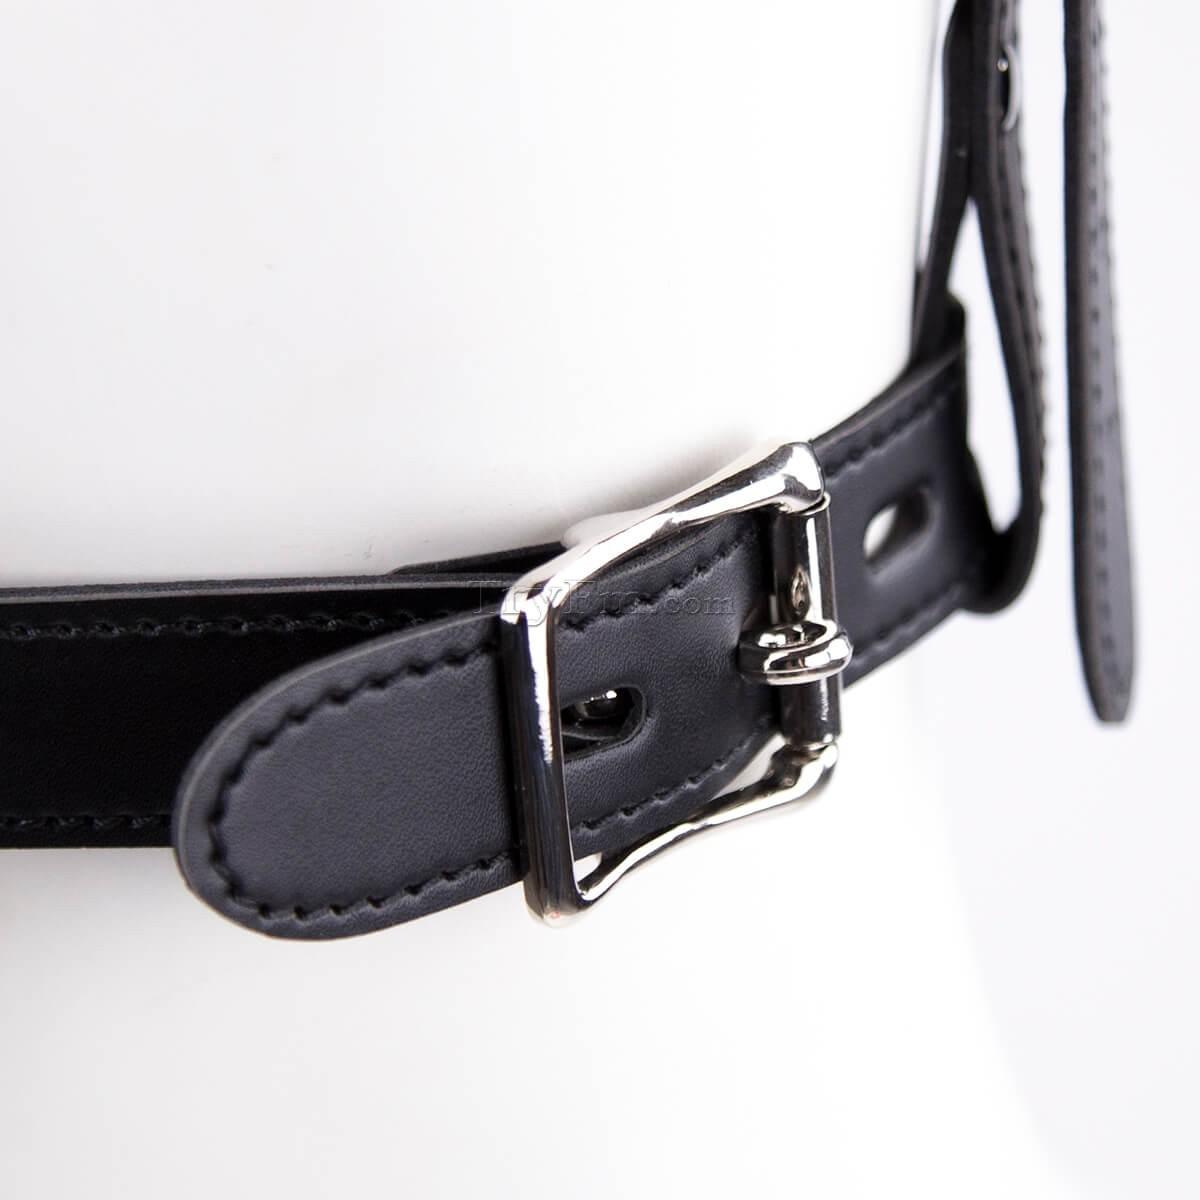 17-Plug-up-Leather-Head-Harness-Mouth-Gag-10.jpg